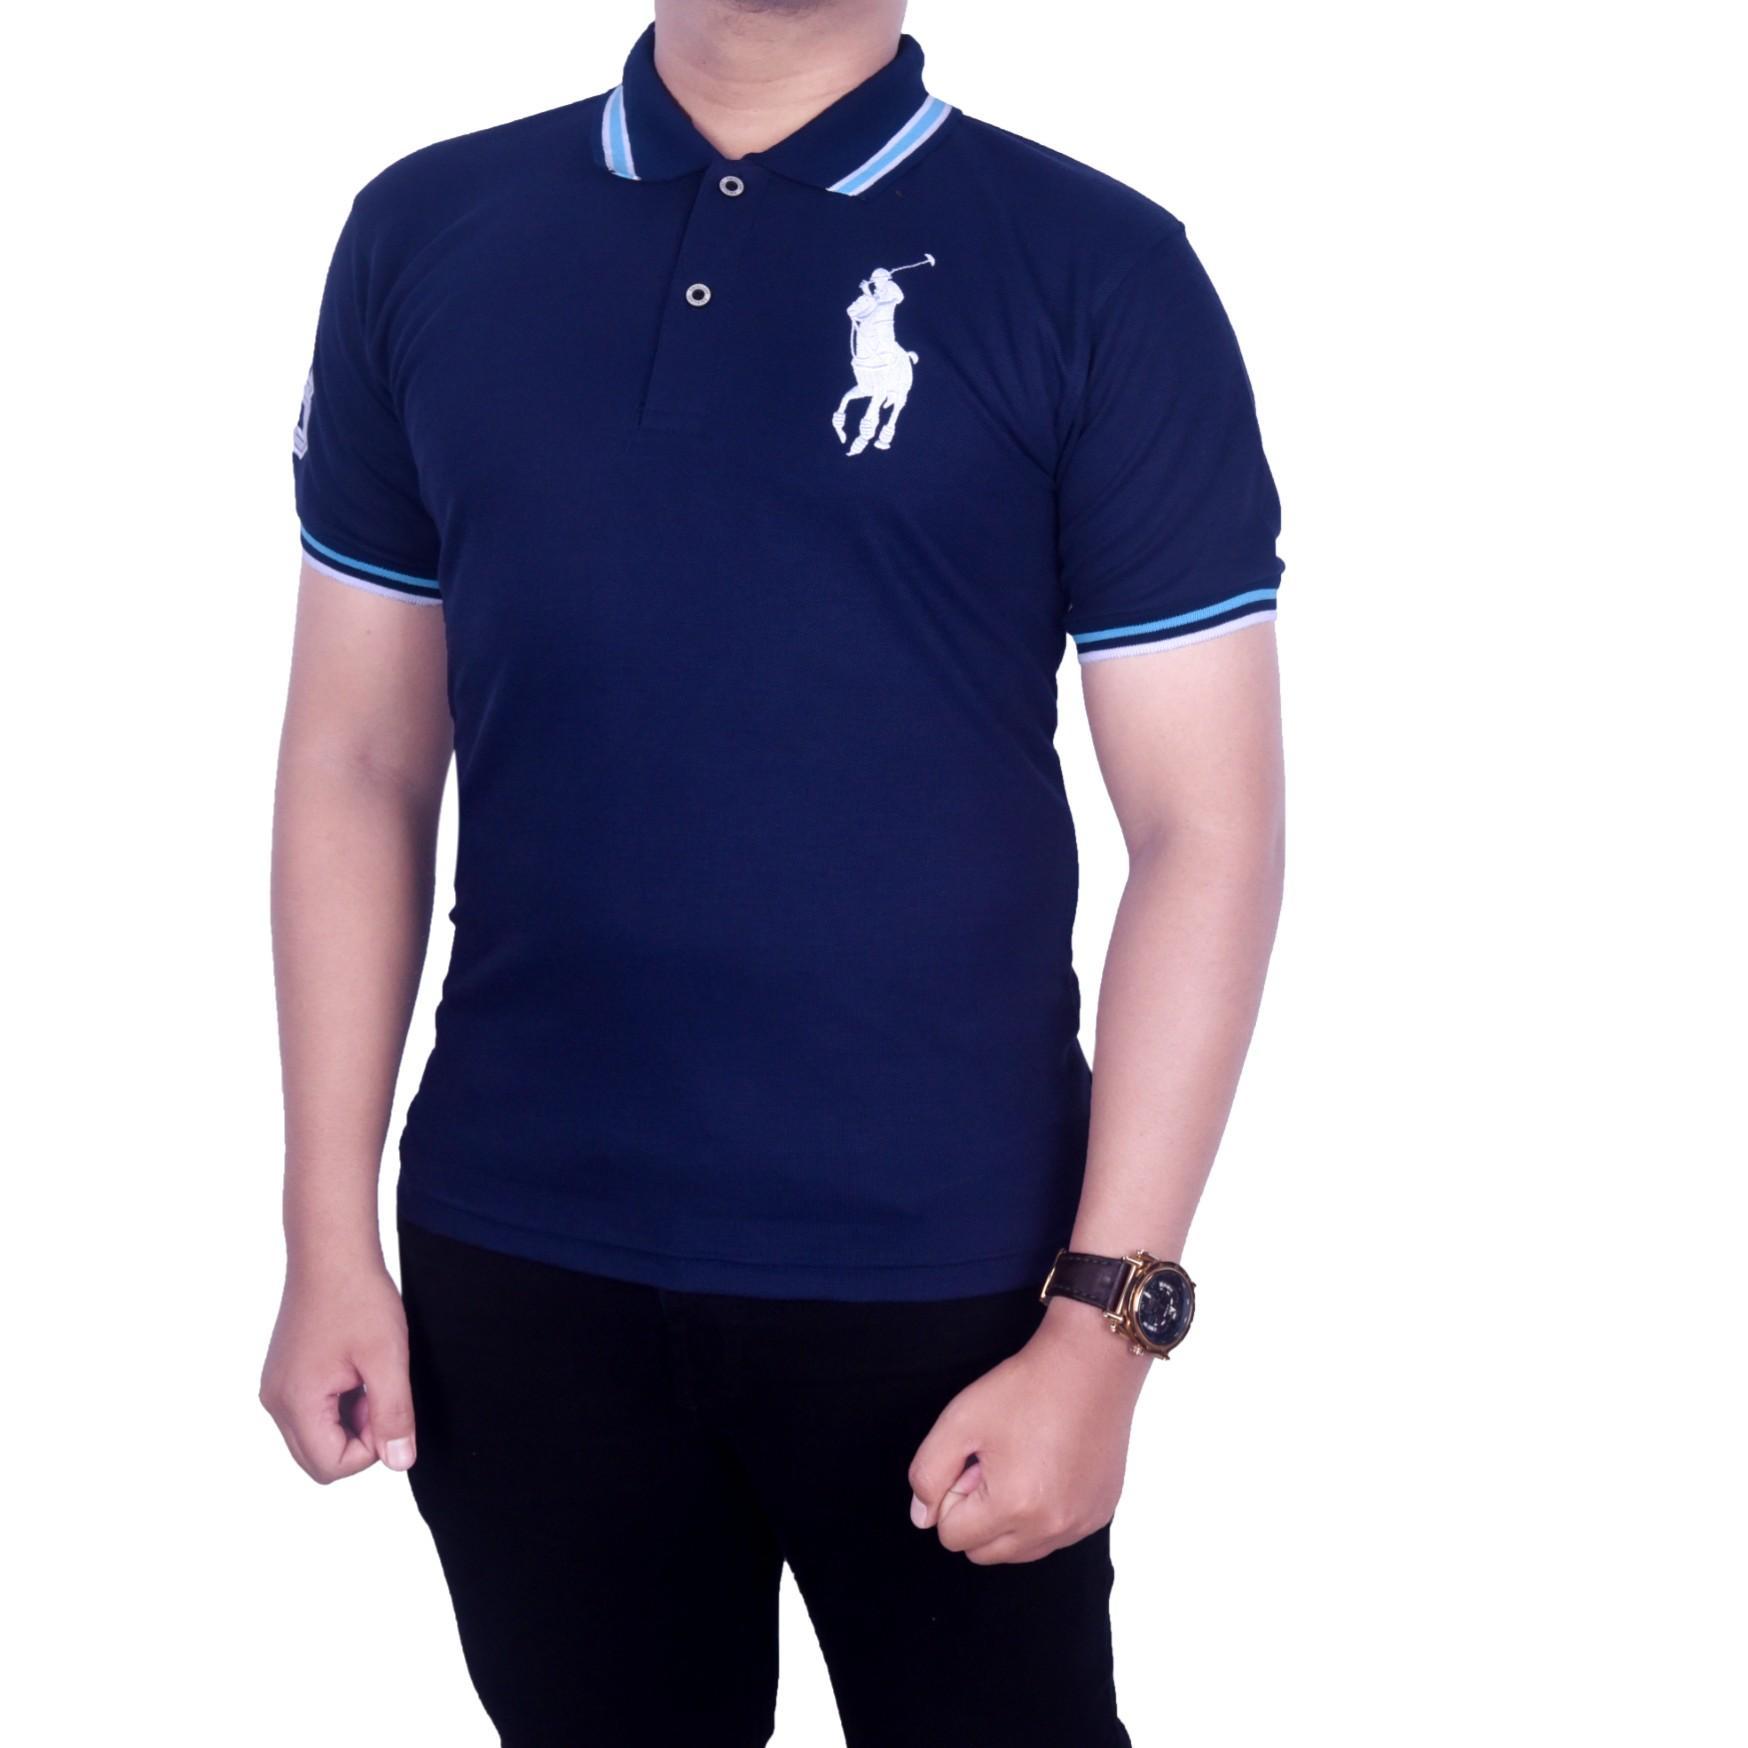 Atasan Dgm Fashion1 Daftar Harga Desember 2018 Fantasia T Shirt Pria Second Flash Hitam Baju Kaos Distro Polo Navy Murah Men Man